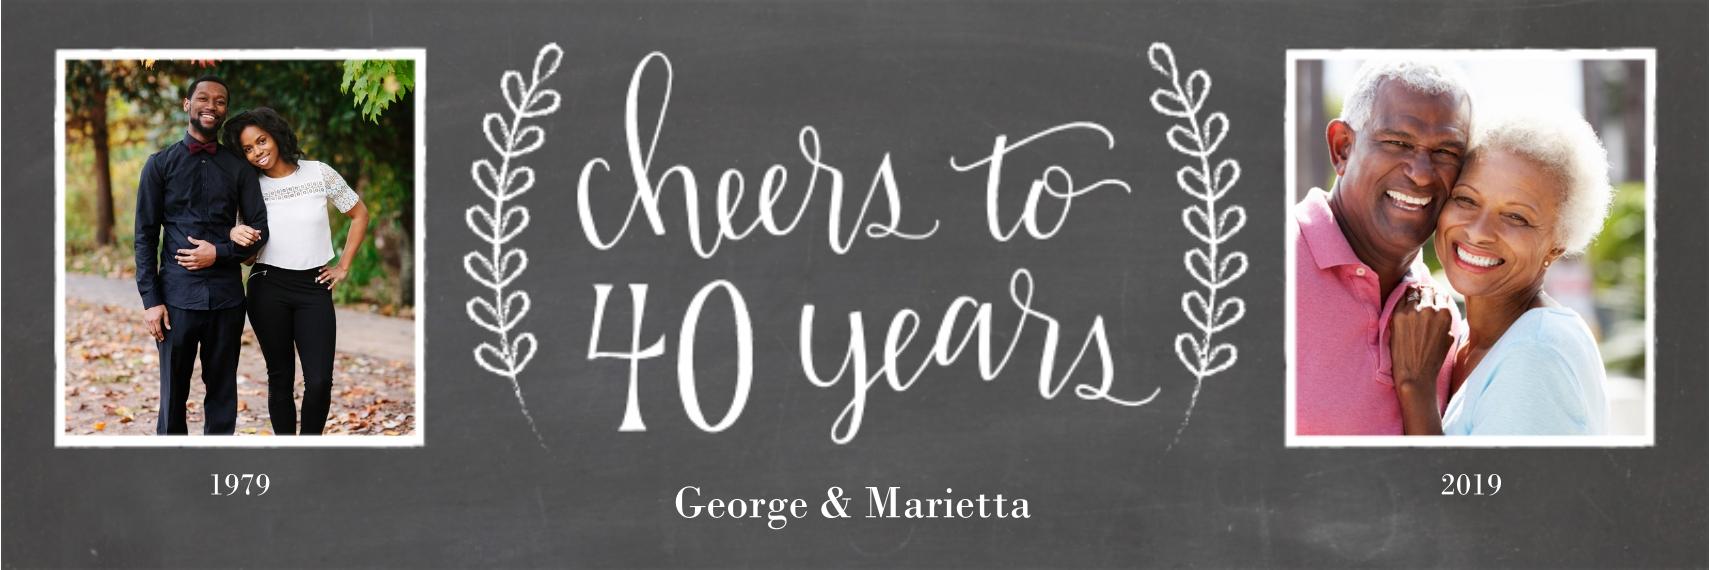 Anniversary Photo Banner 1x3, Home Décor -Chalkboard Anniversary